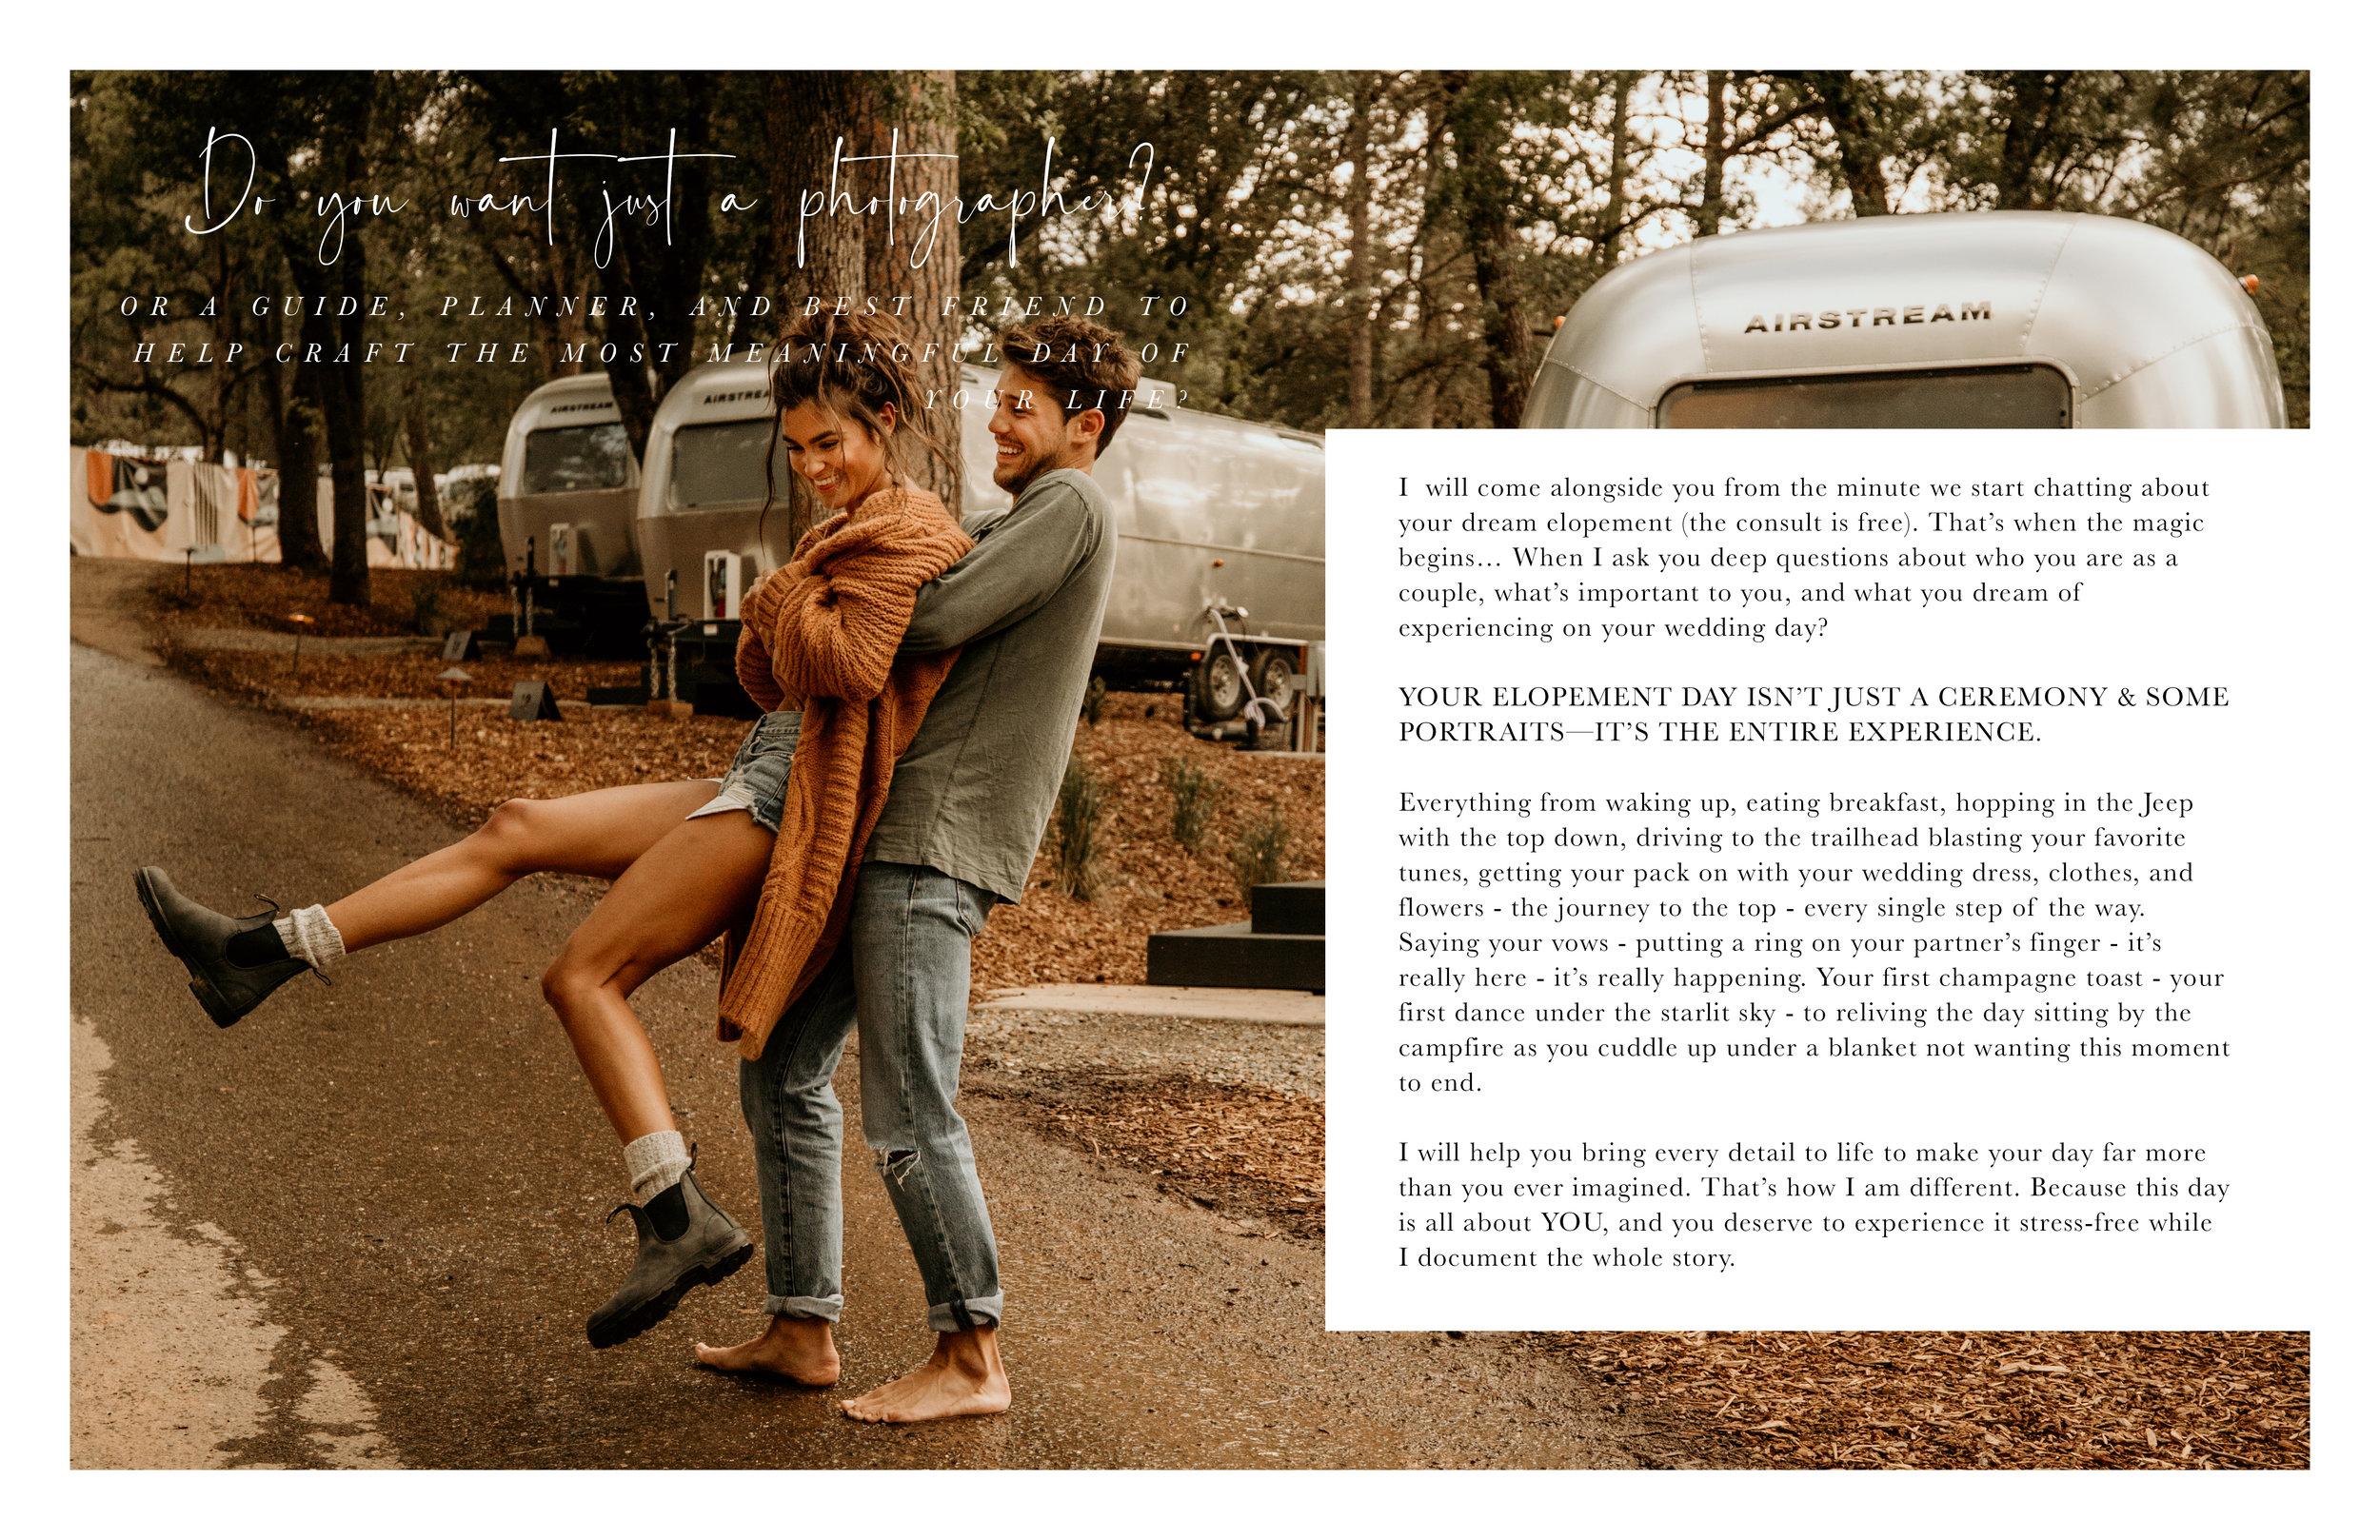 elopement photographer -engagement-wedding-love-little-rock-arkansas-photographer-erin-venable-photography-bride-groom-palm-springs-california-dessert